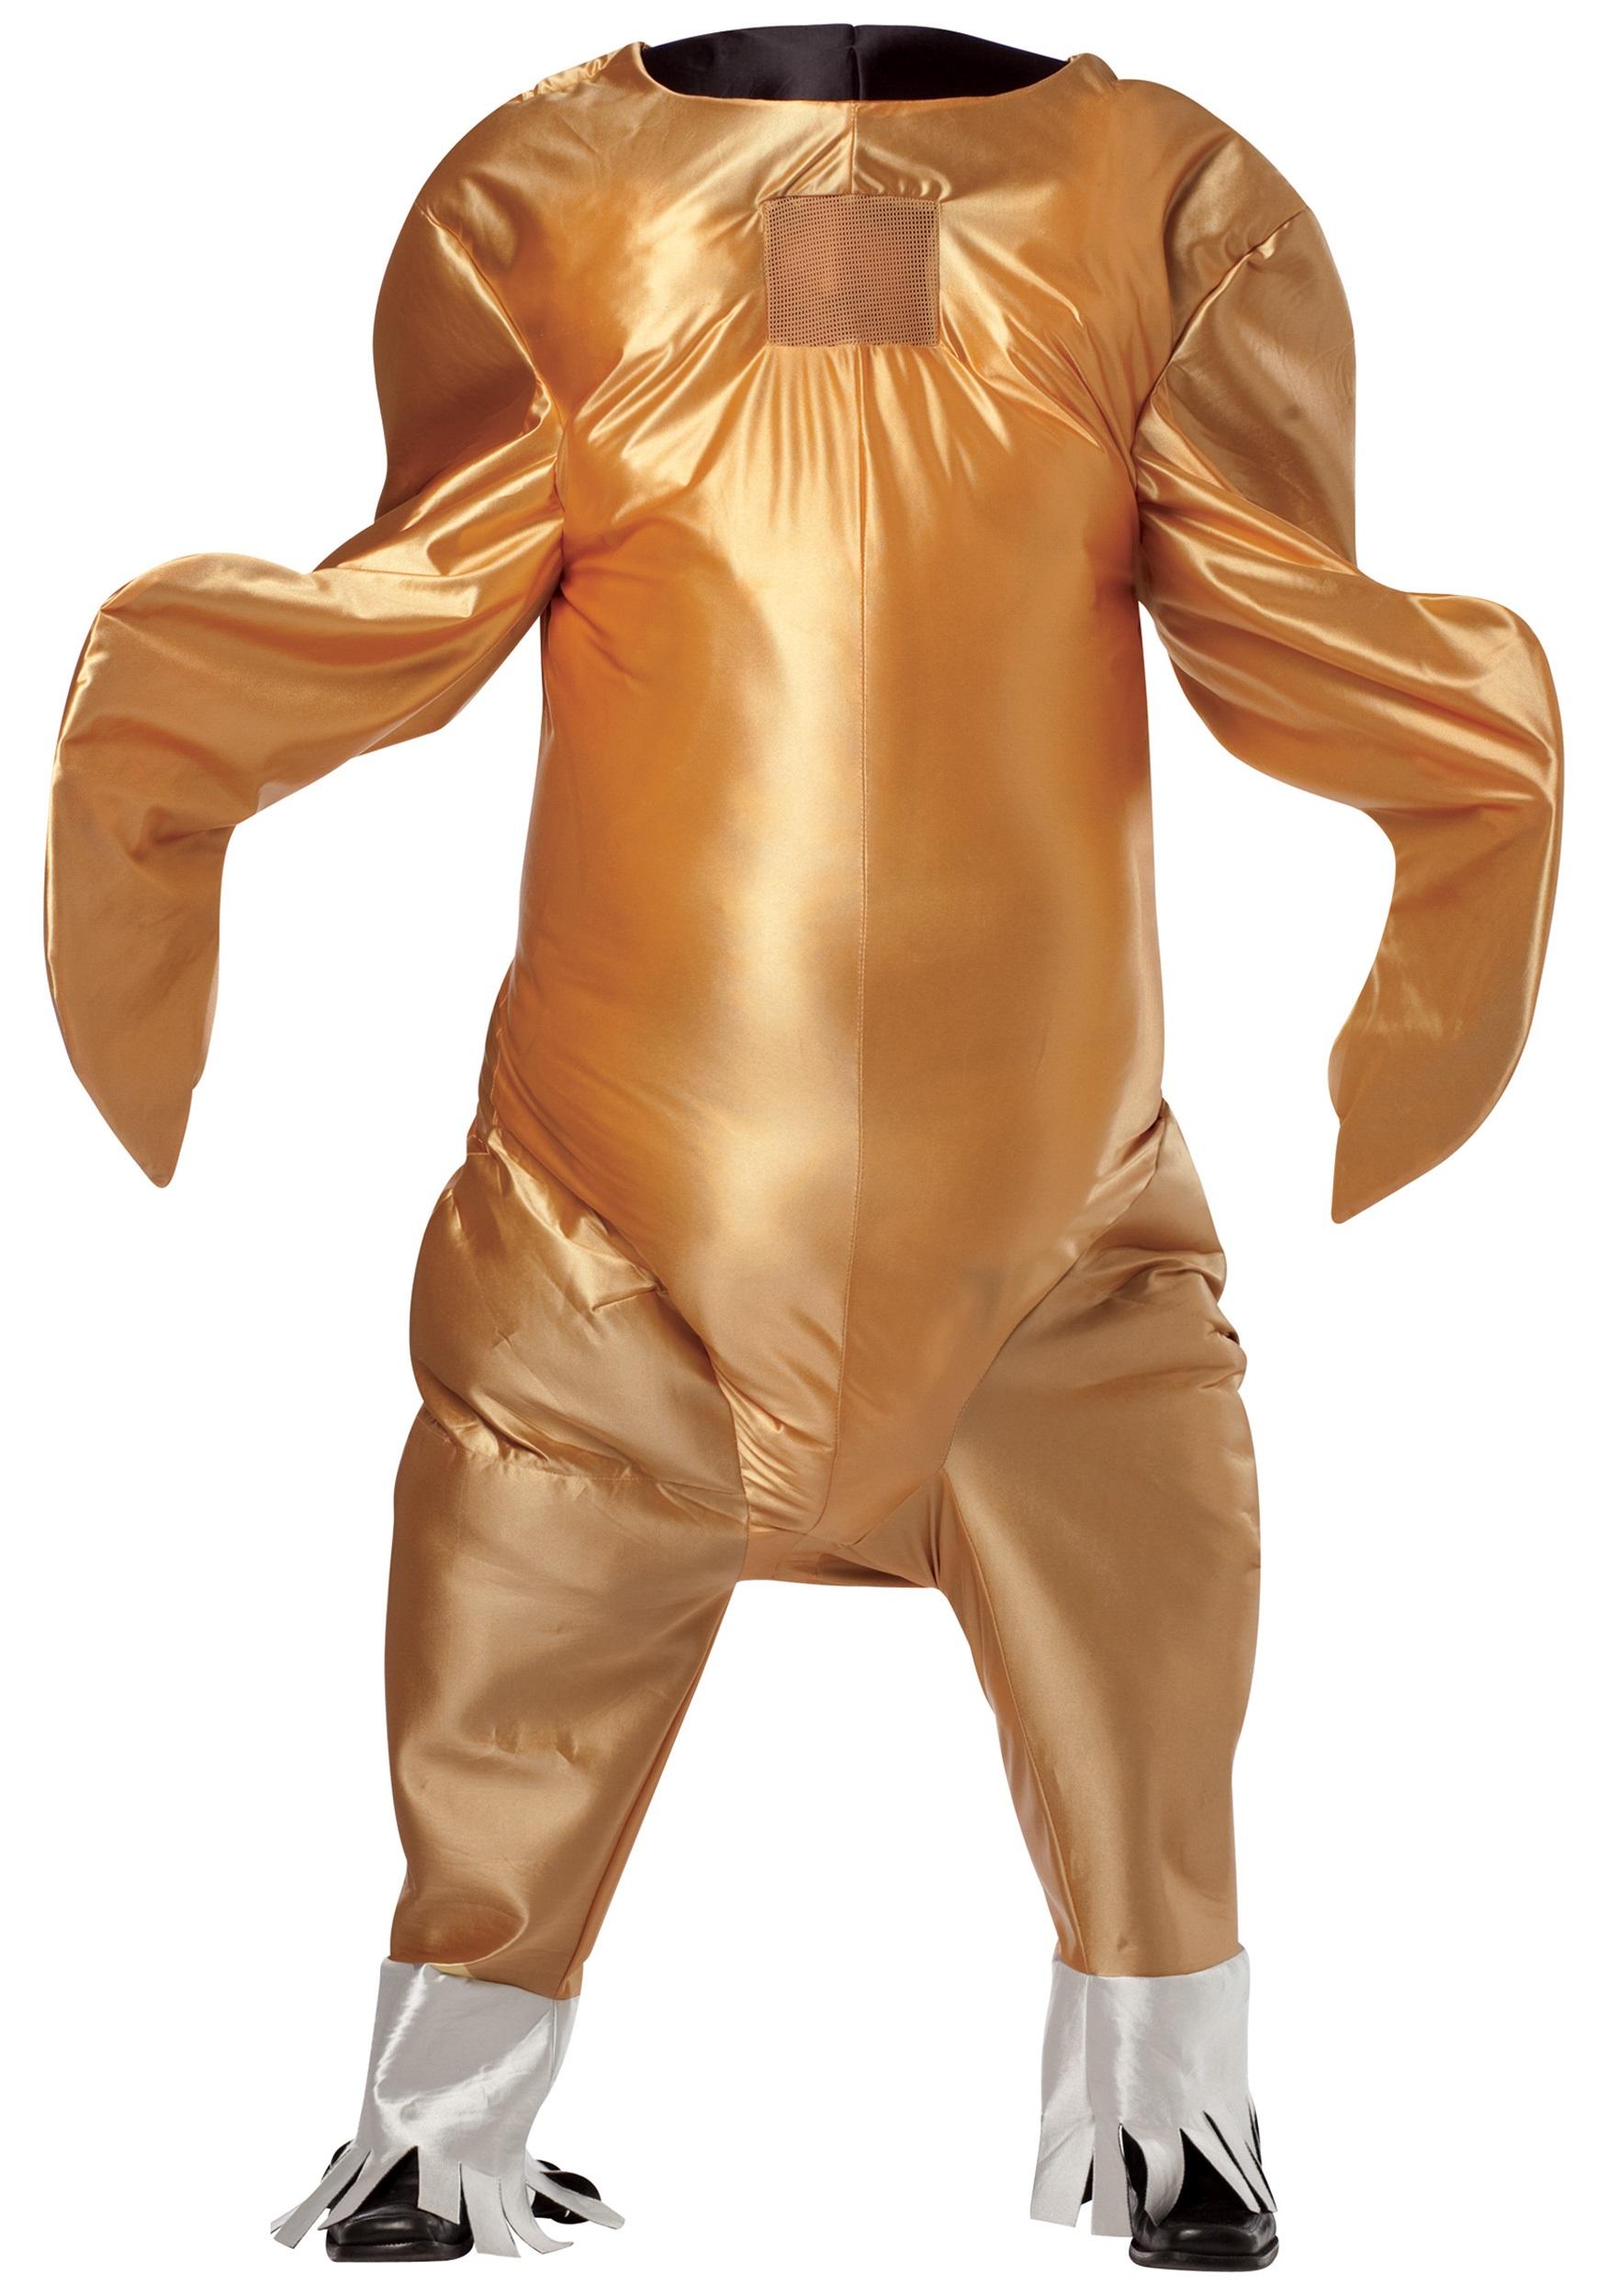 hot guy turkey costume